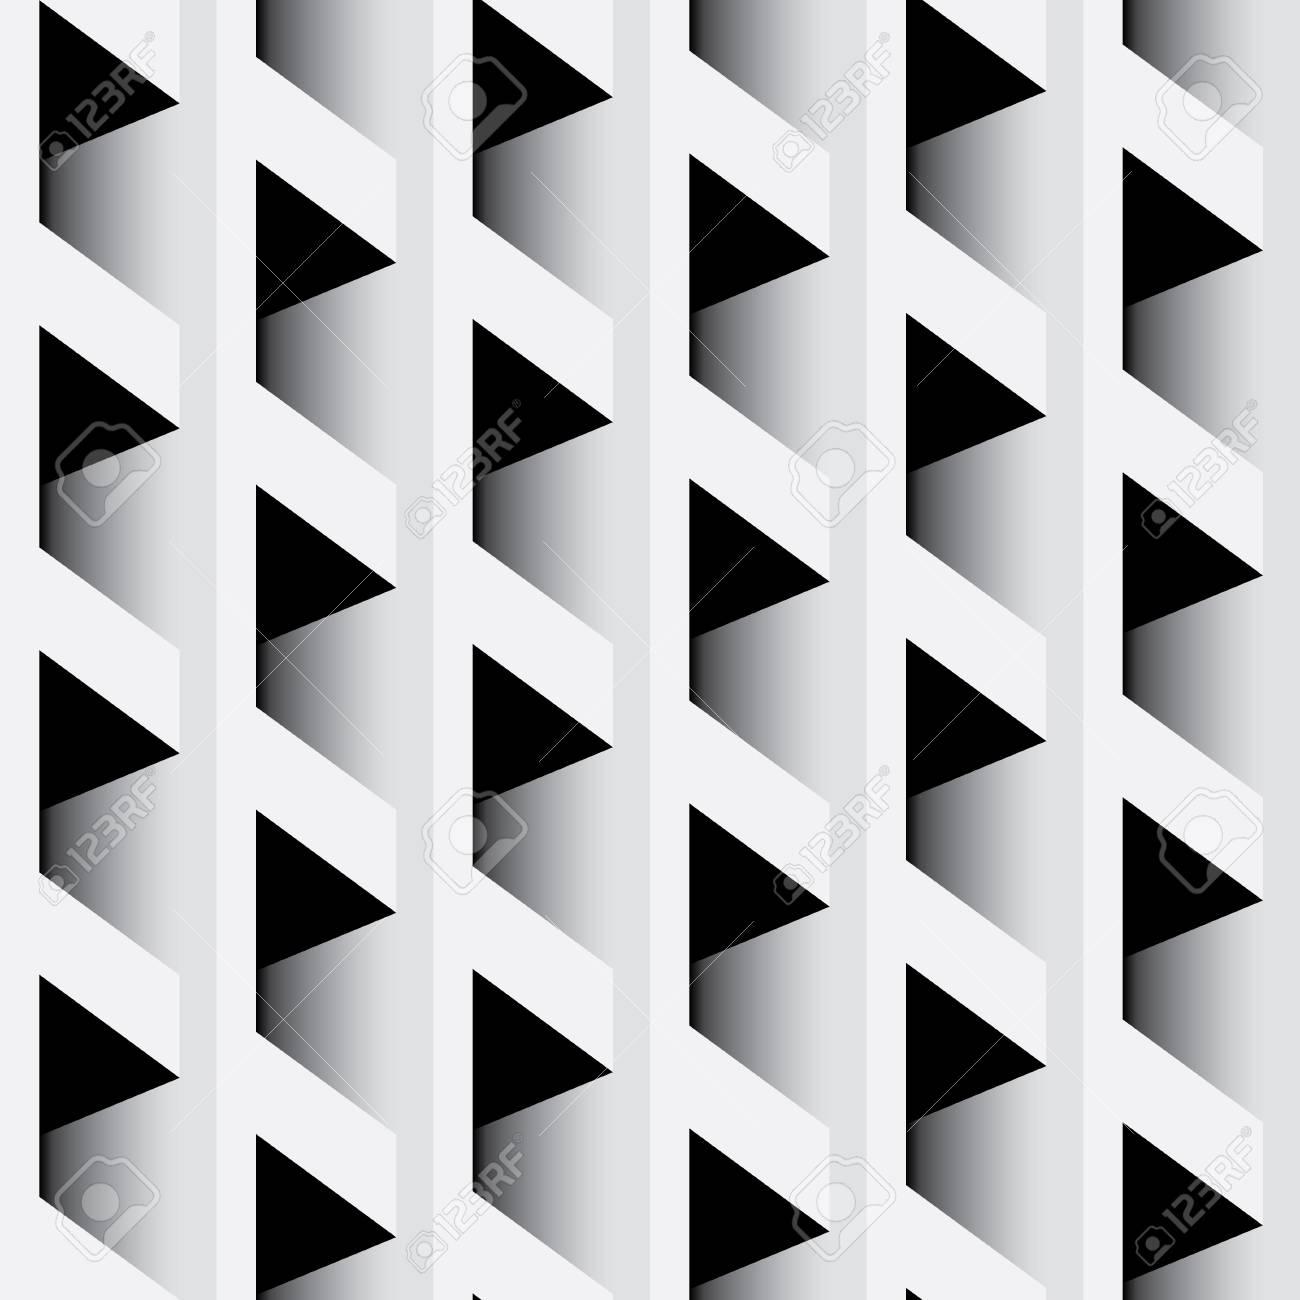 Abstract Paneling Pattern Modern Stylish Texture Black White